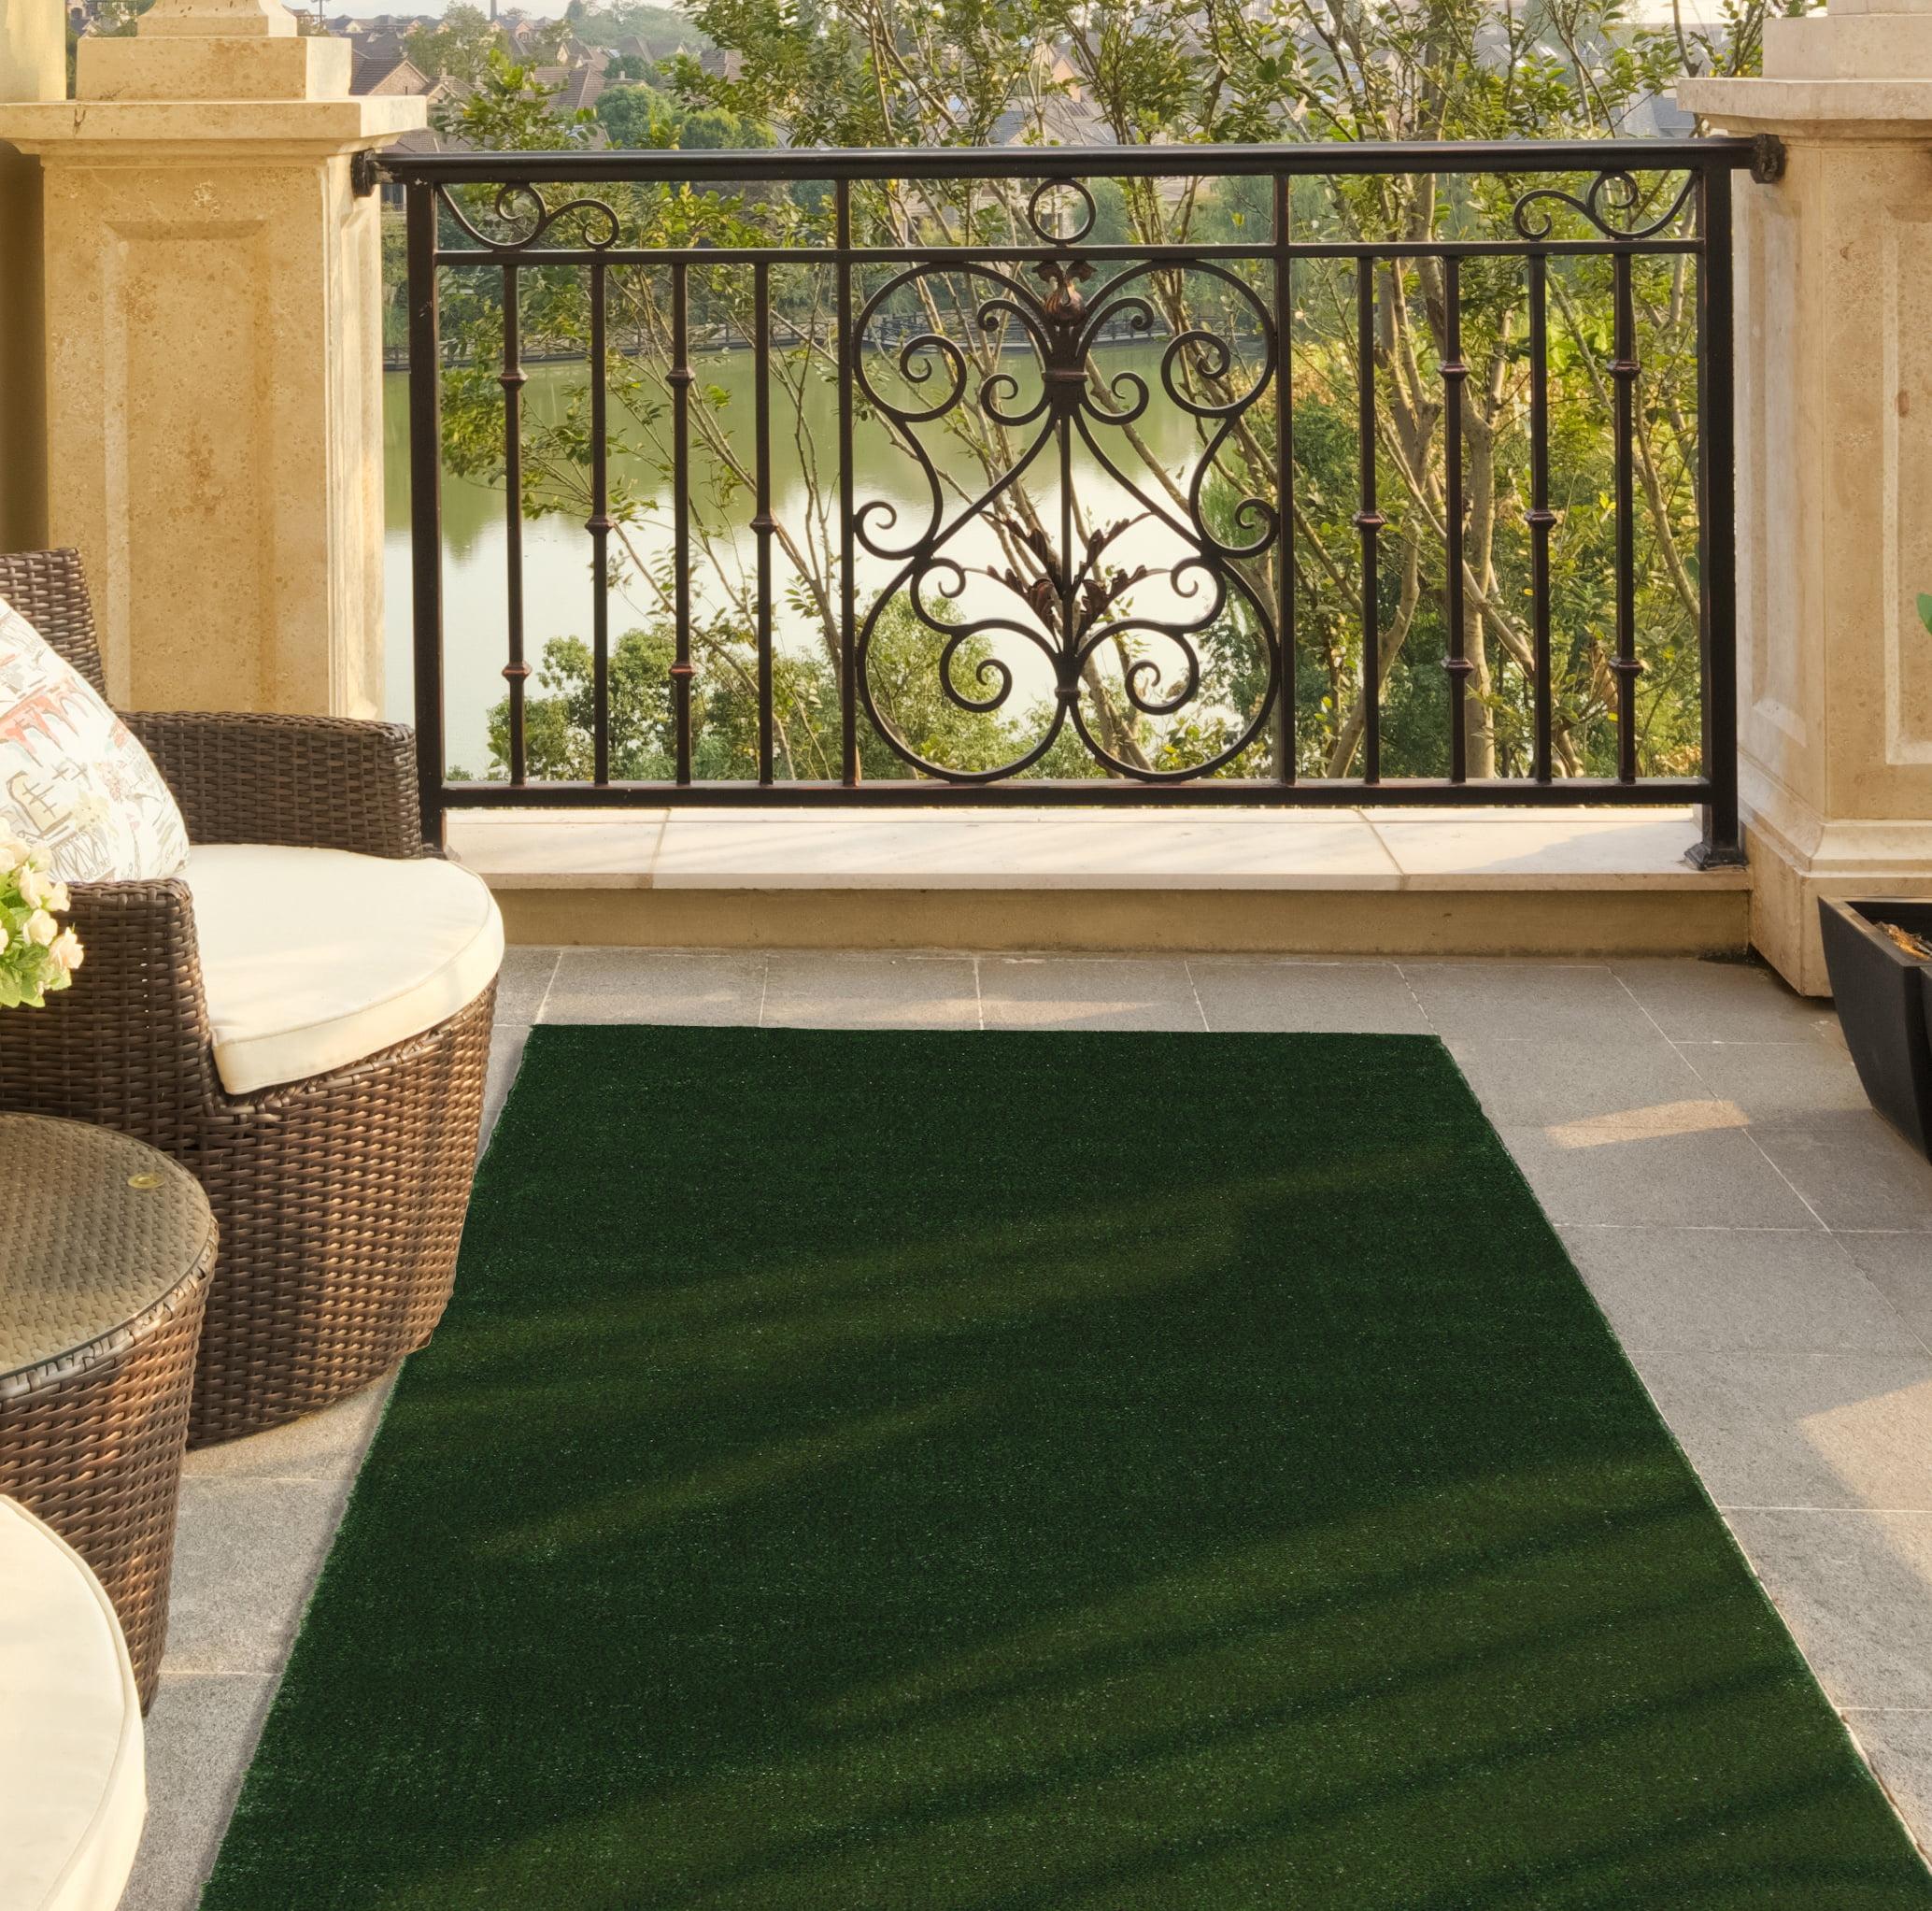 "Ottomanson Evergreen Collection Indoor/Outdoor Green Artificial Grass Turf Solid Design Runner Rug, 6'0"" x 7'3"""